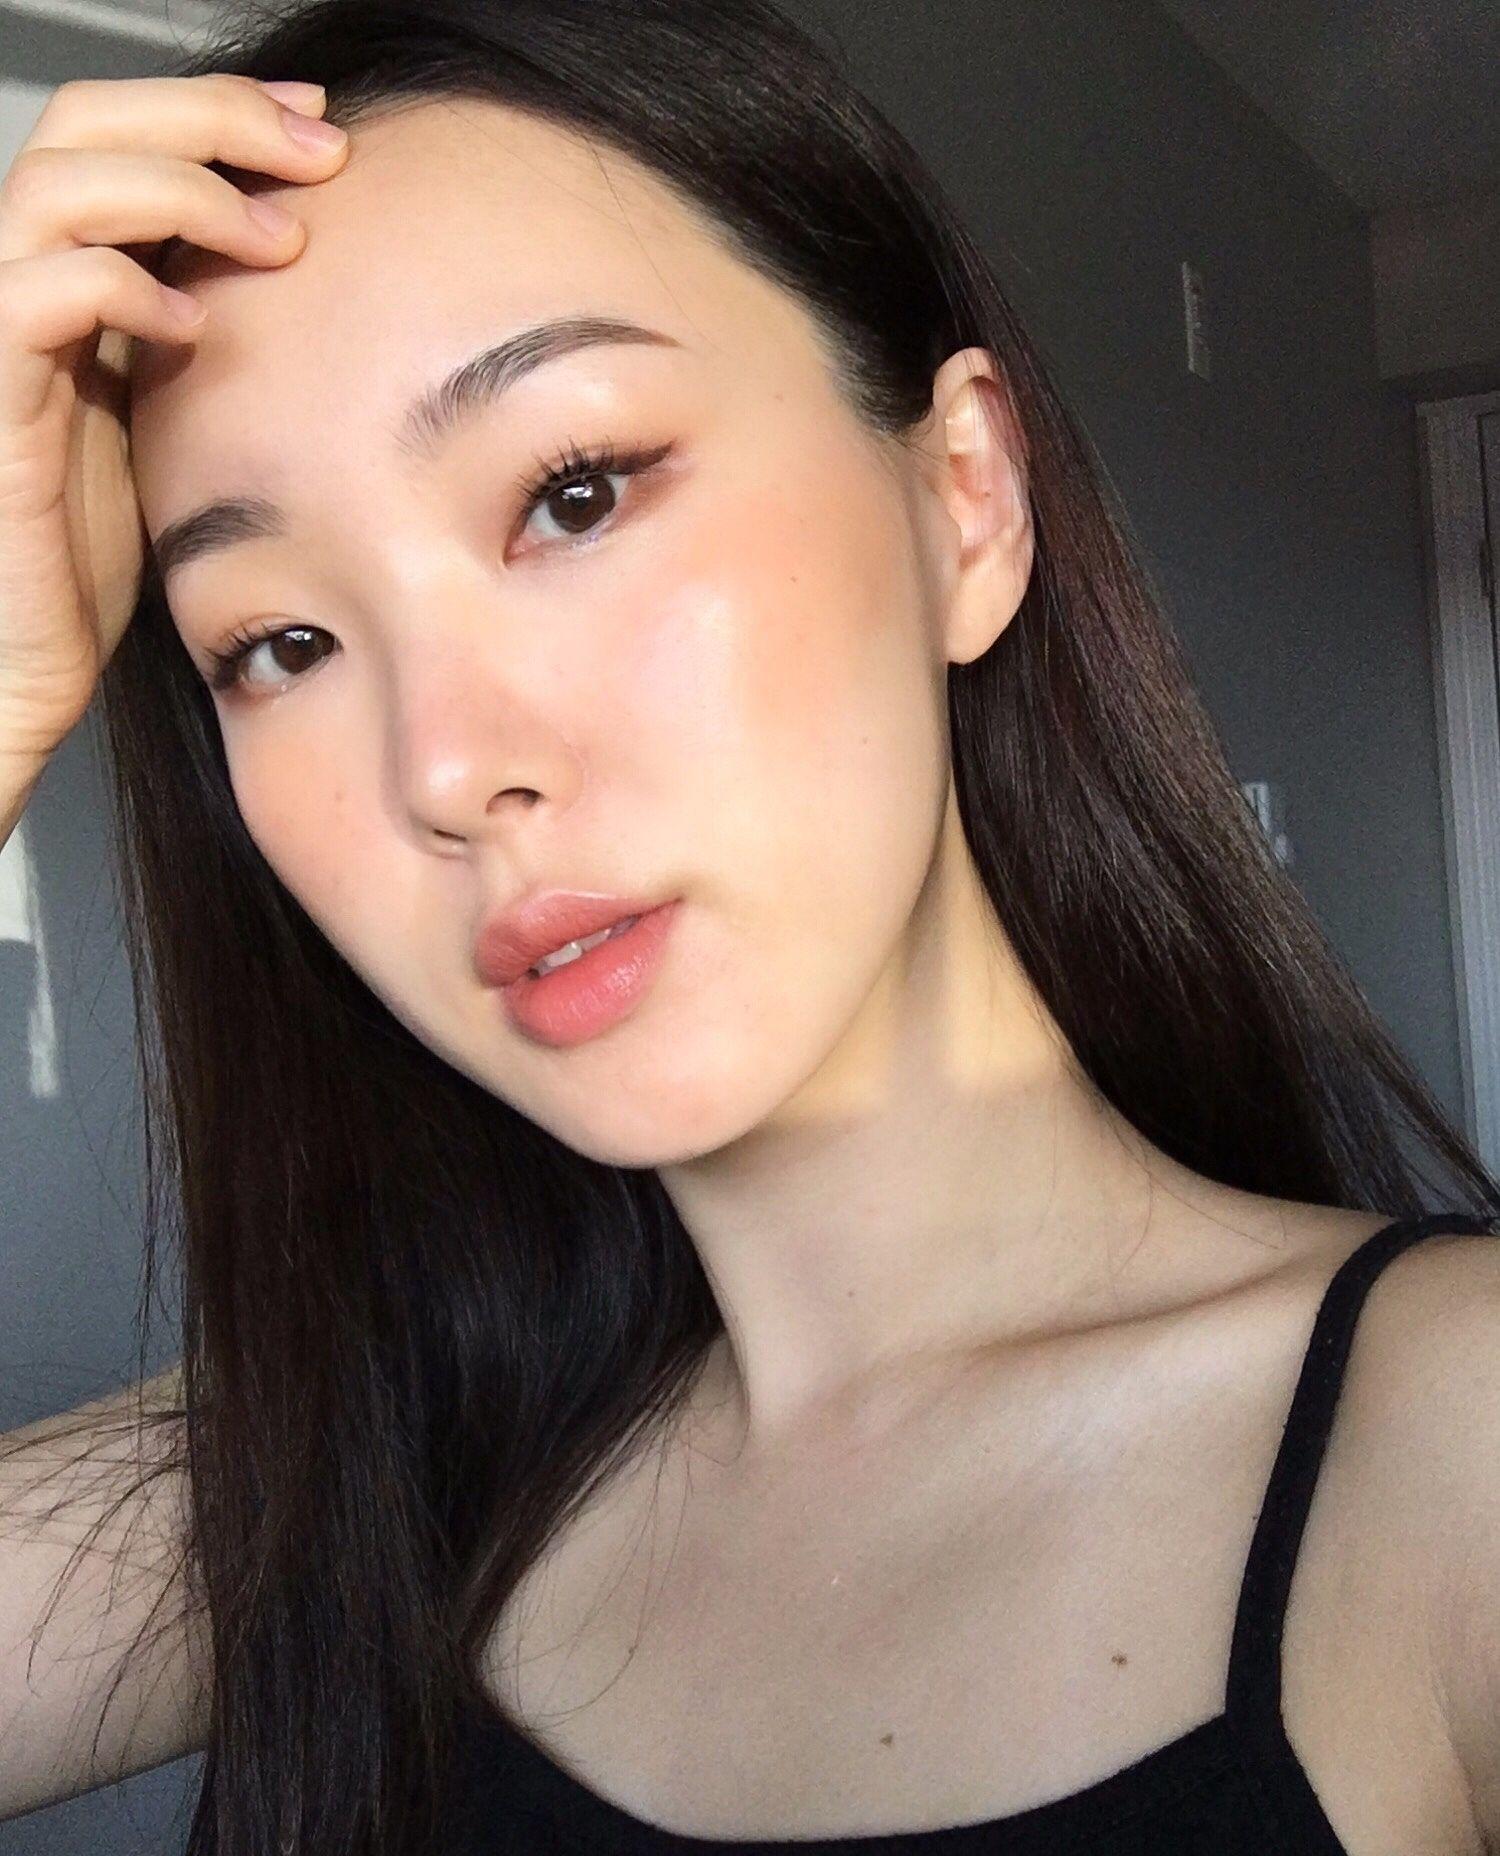 jeontaesthetic KoreanMakeupLook in 2020 Asian makeup